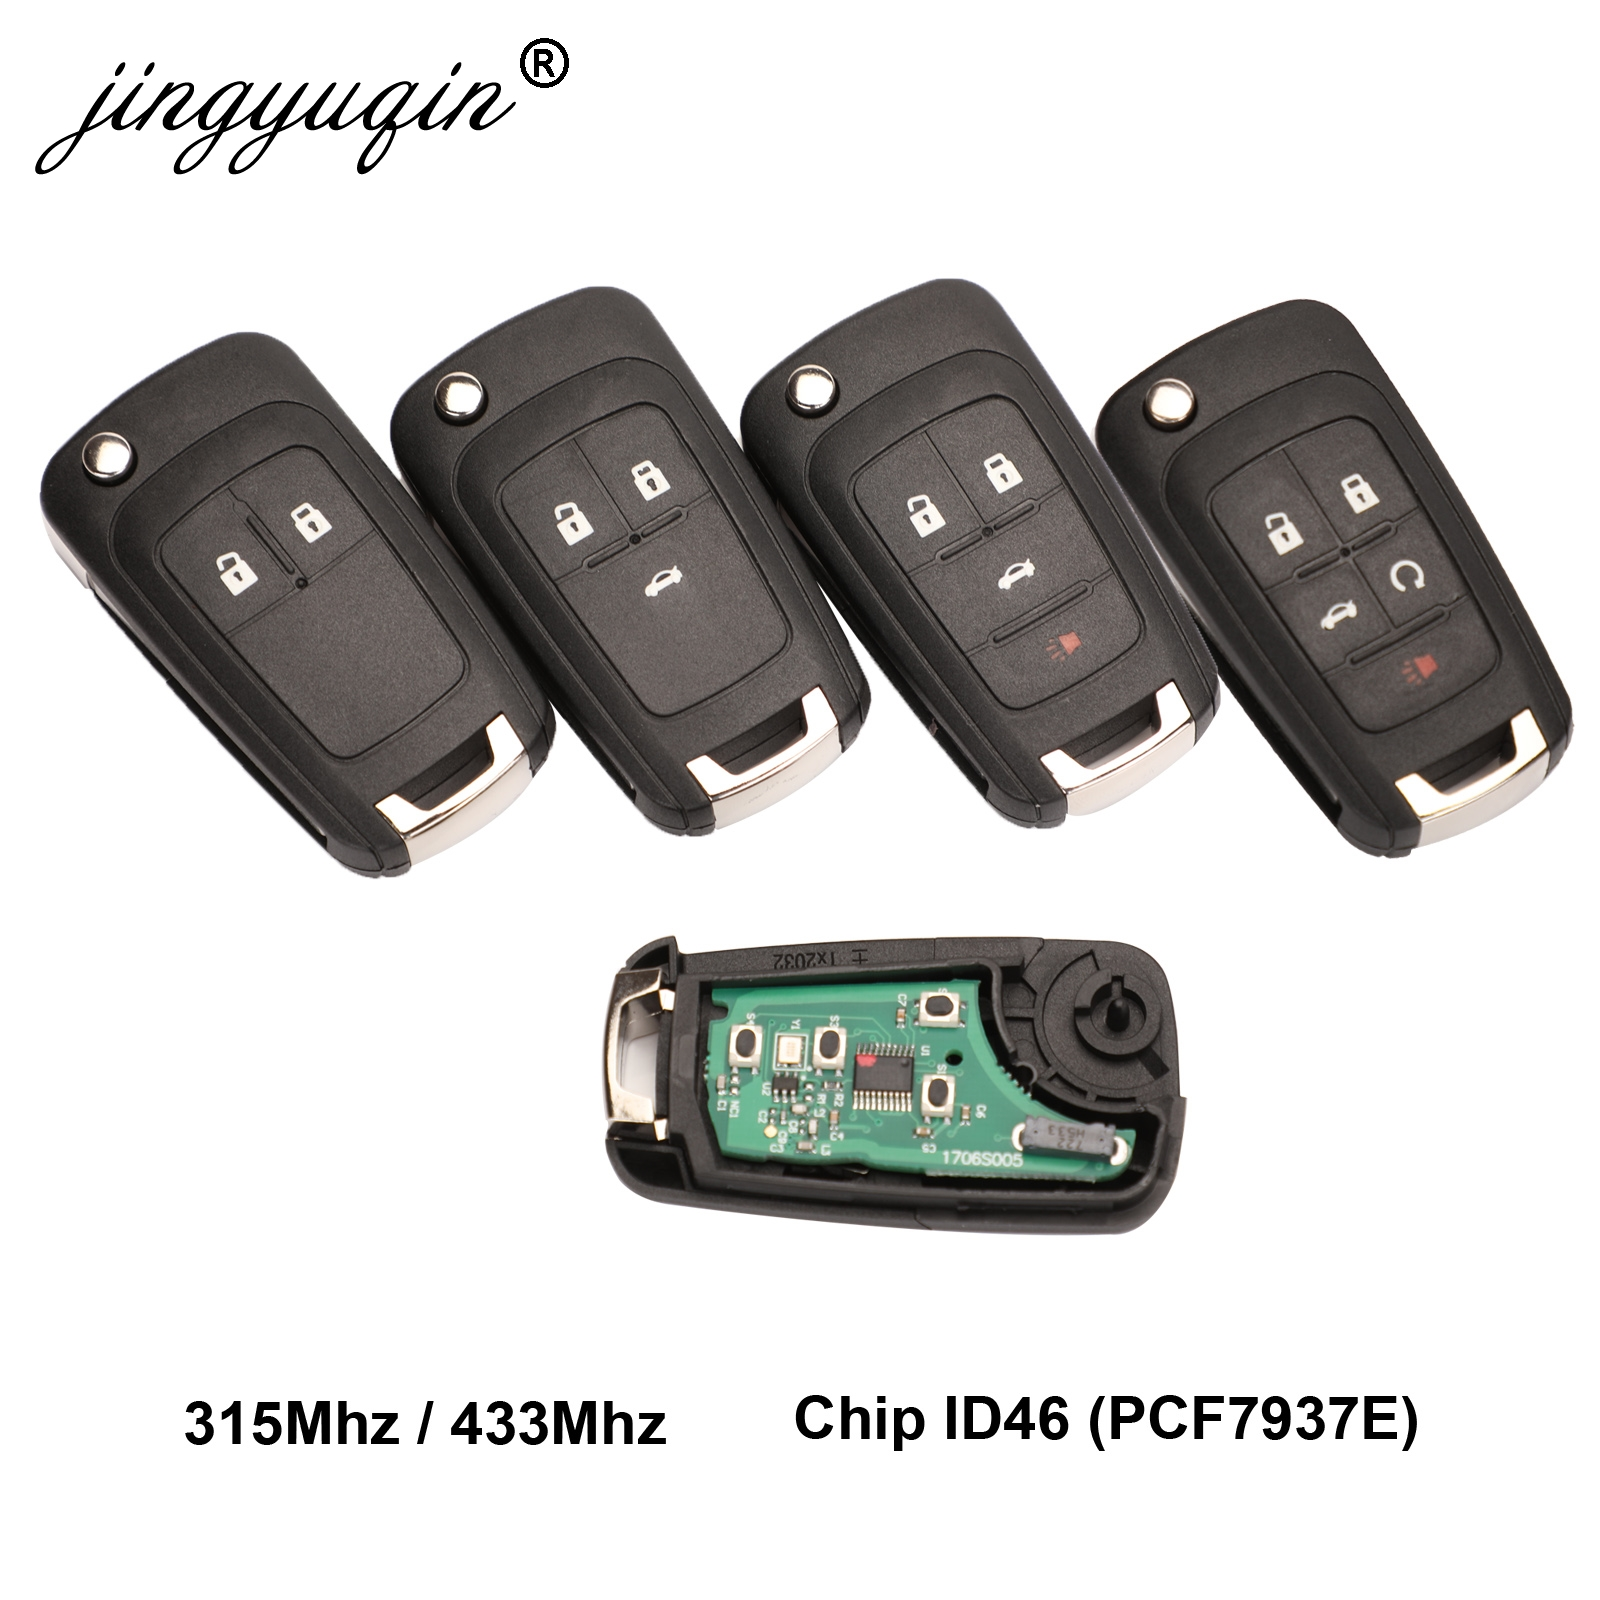 QCONTROL 3 Buttons Car Remote Key DIY for OPEL//VAUXHALL Astra J Corsa E Insignia Zafira C 2009-2016